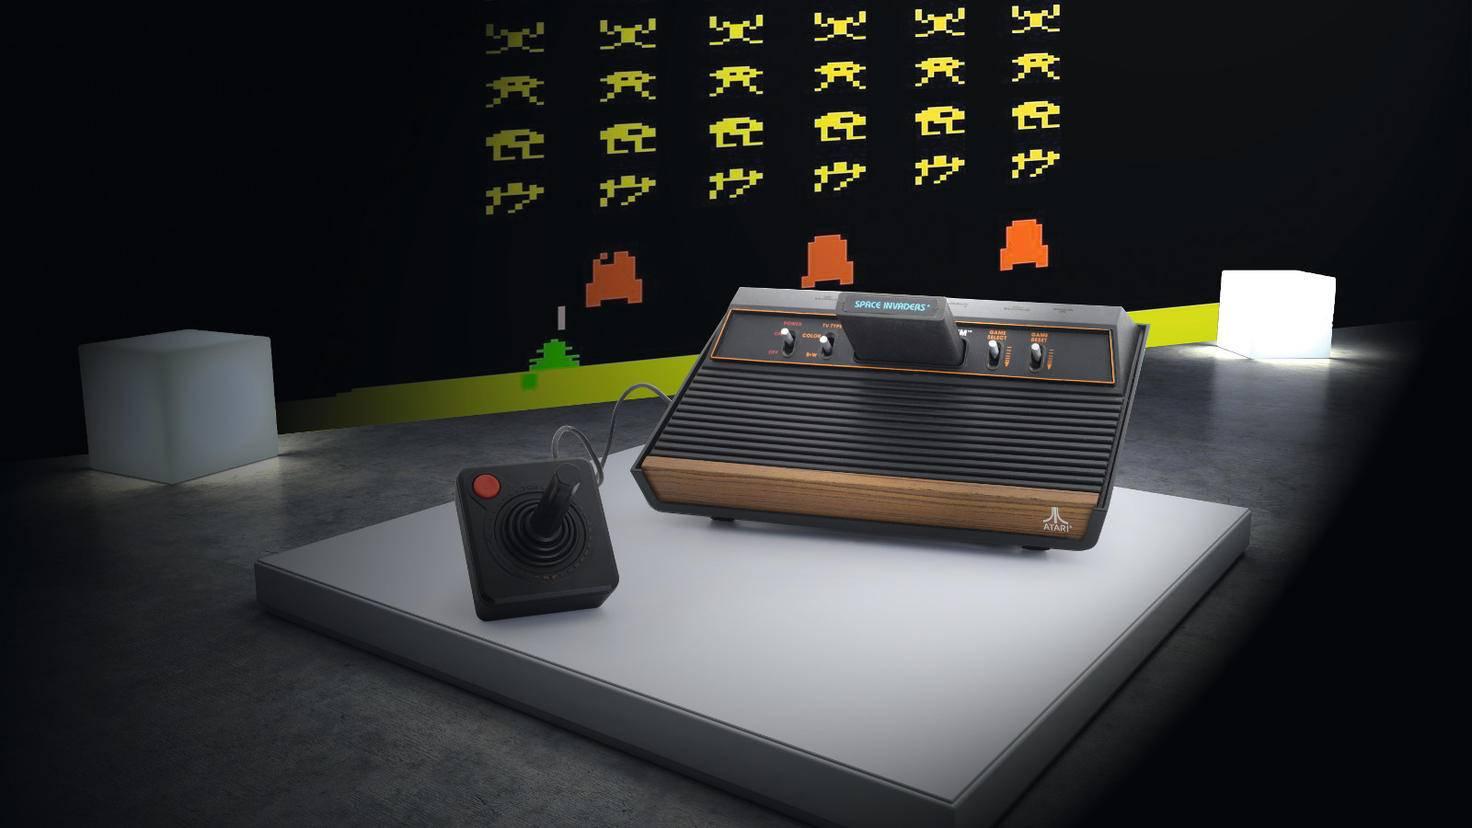 "500 Games, 30 Millionen verkaufte Geräte: Ataris Erfolgskonsole ""Atari VCS"" gilt als größter Schritt der elektronischen Spiele."